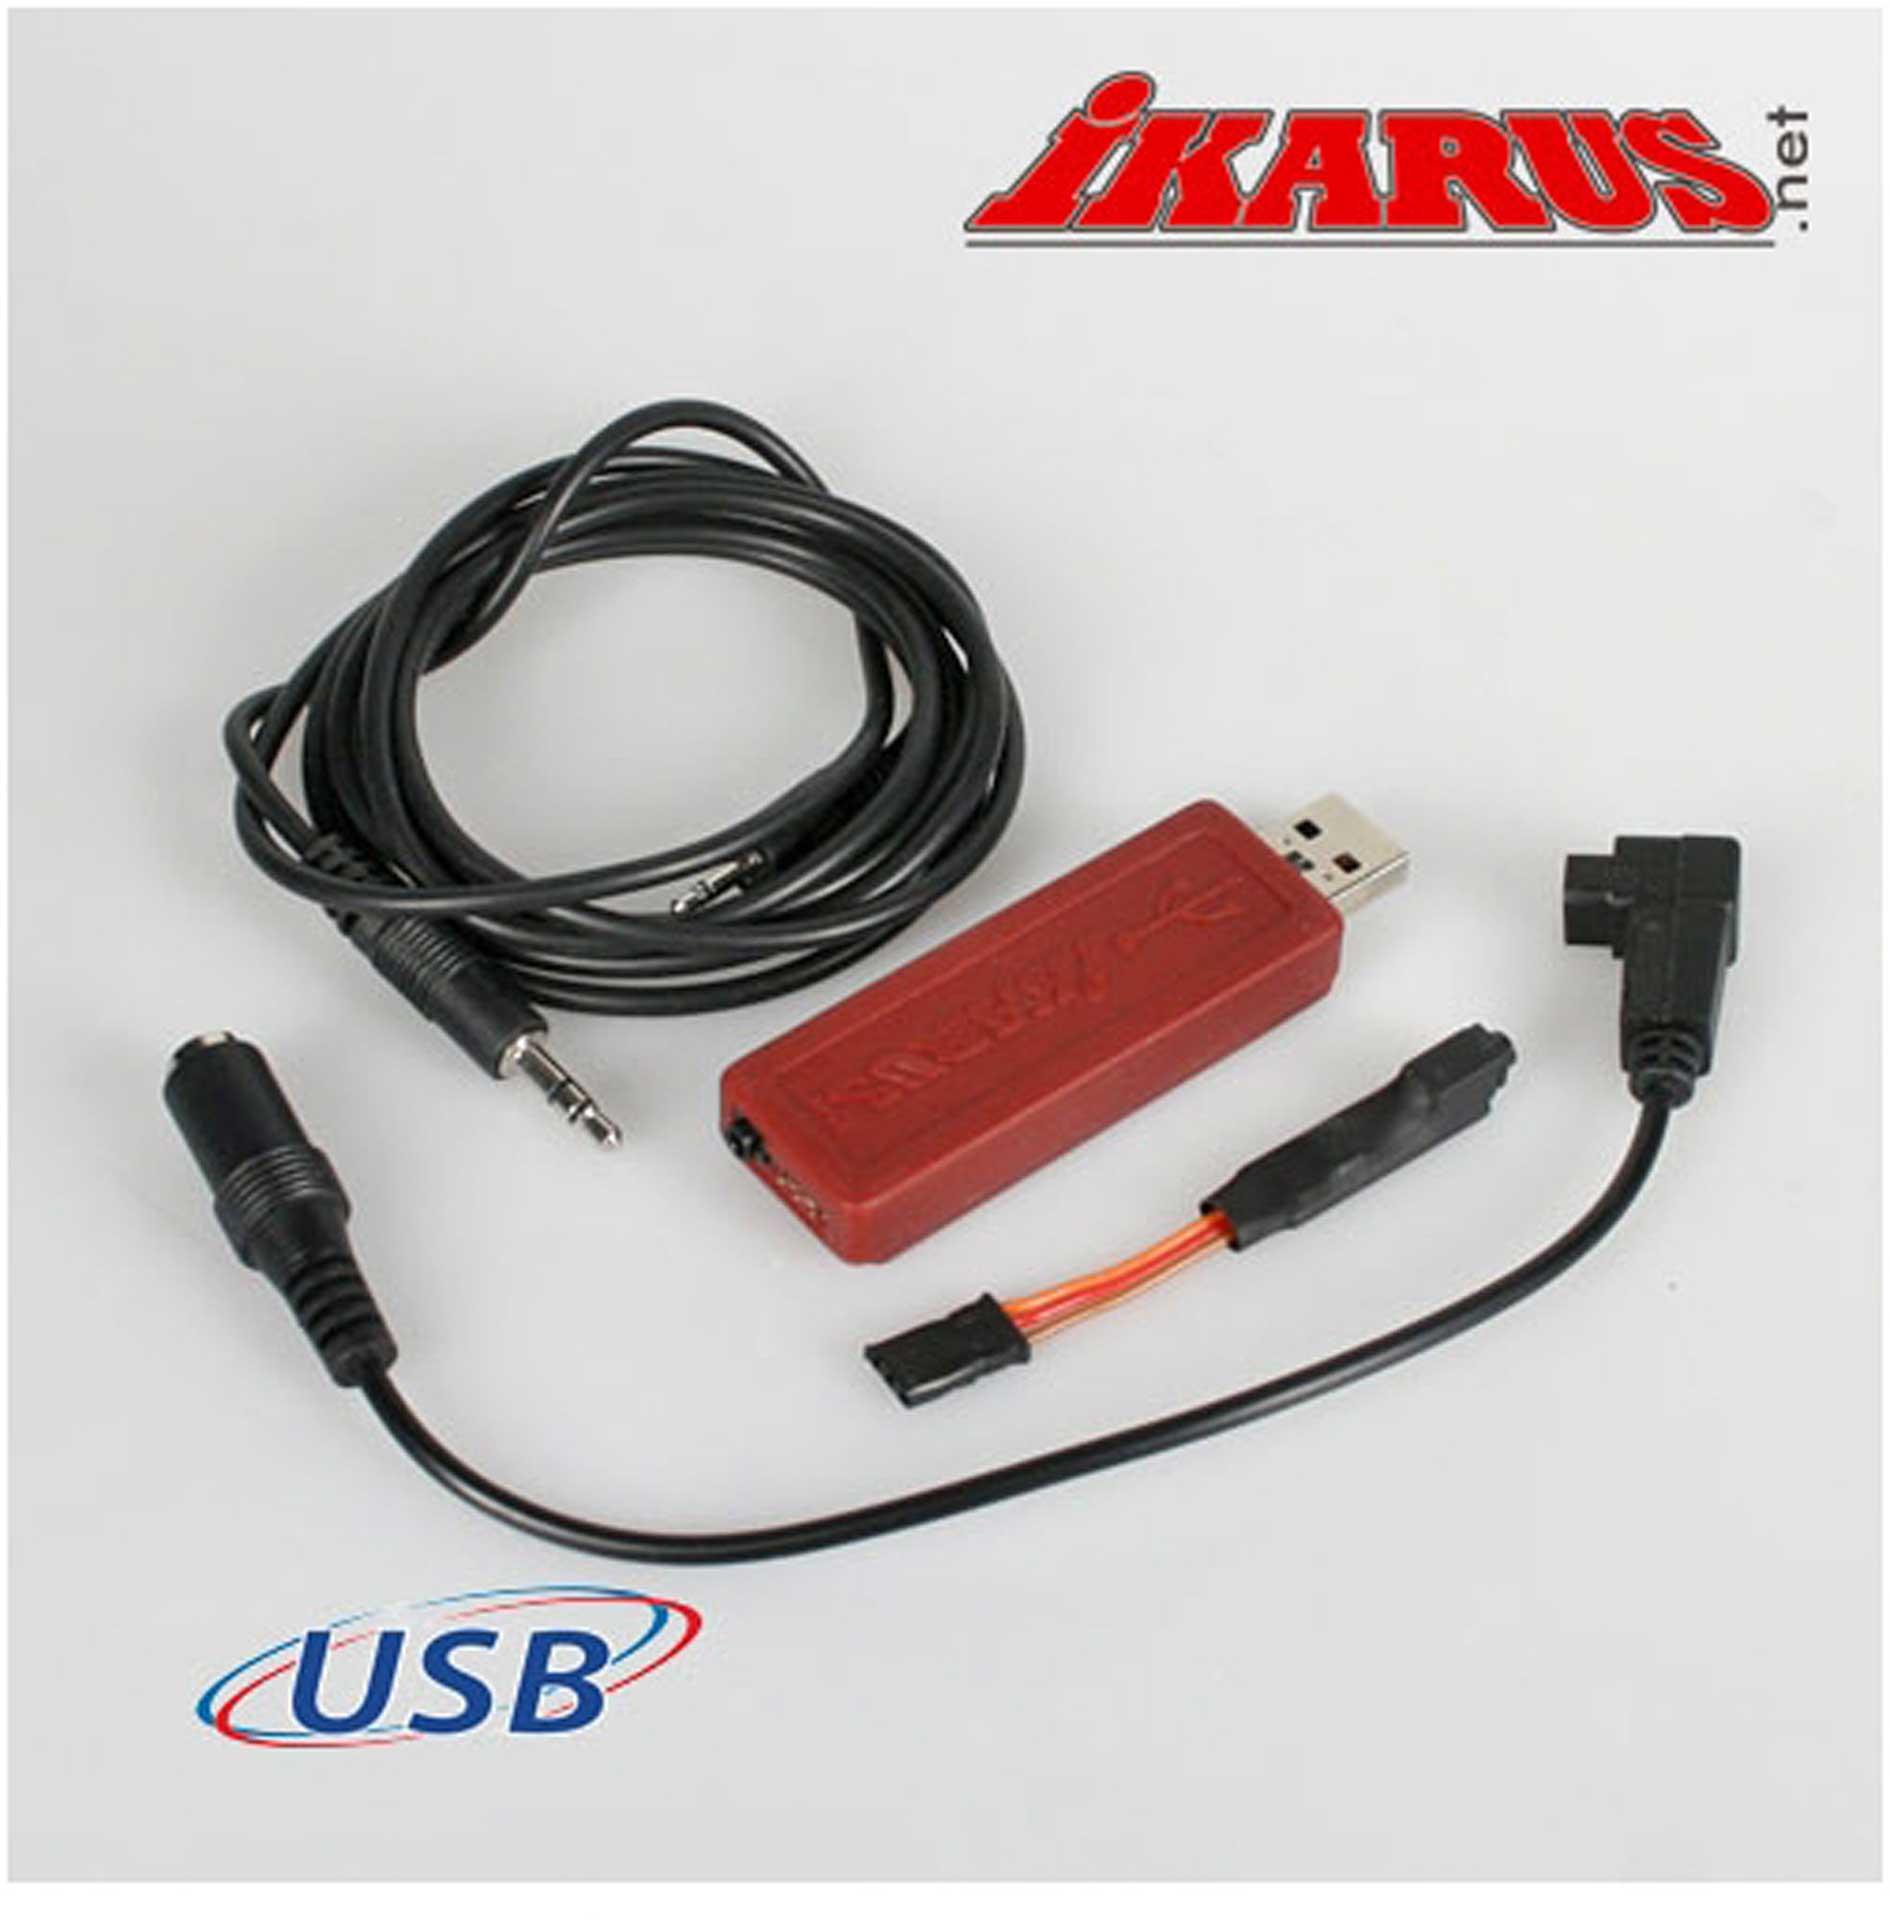 IKARUS USB-Interface set for 6-pin-Student socket (FUTABA)